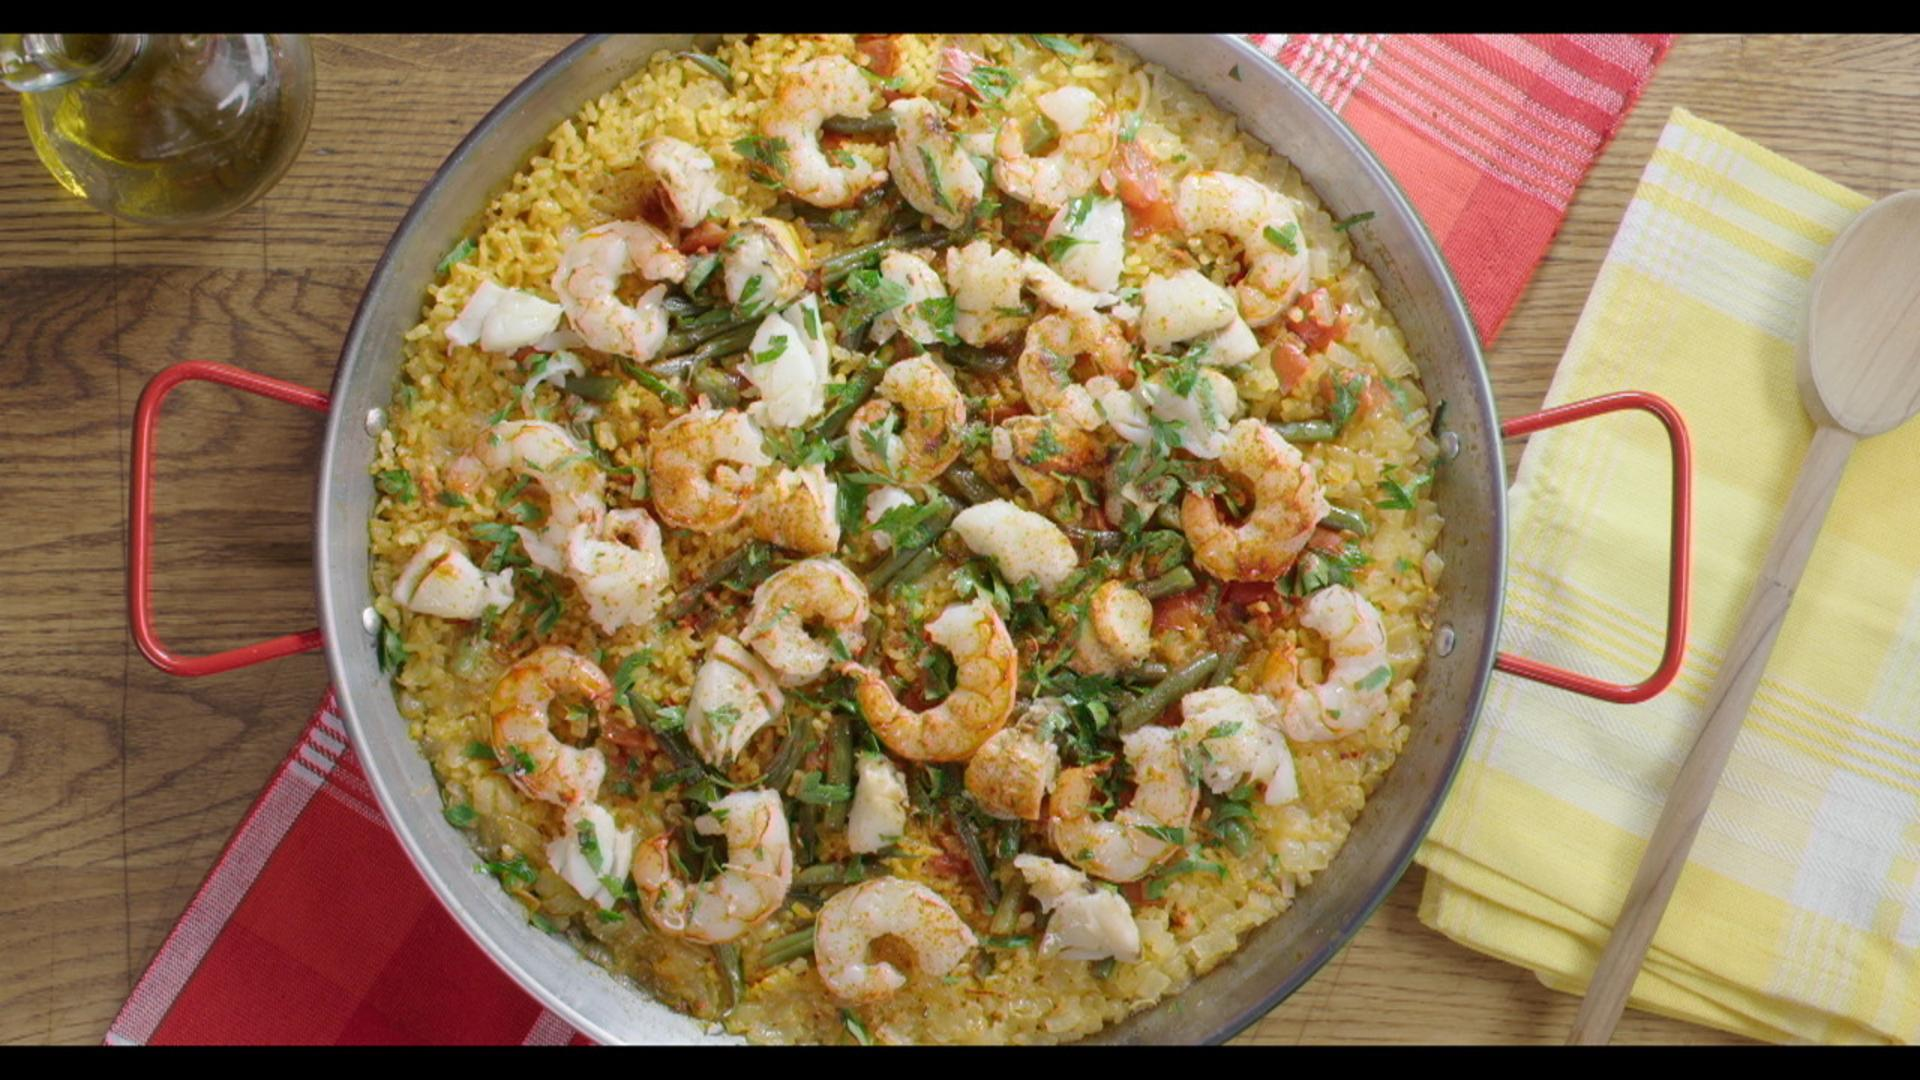 Best Bites: Easy seafood paella